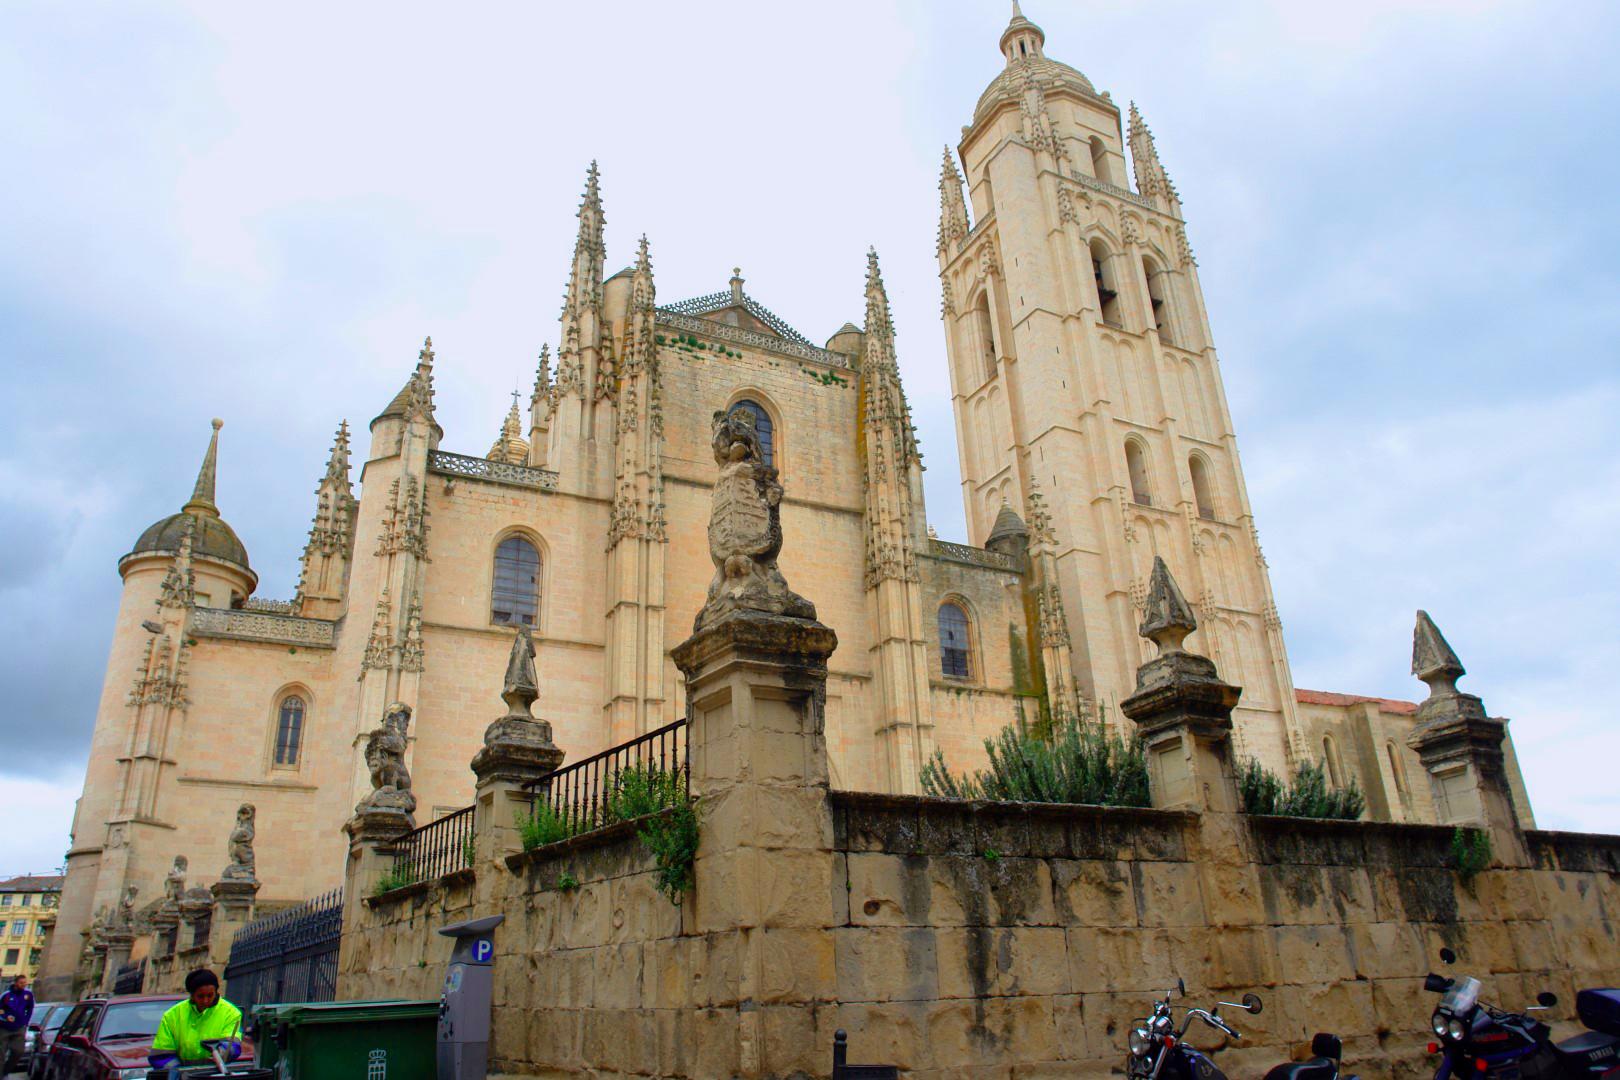 Qué ver Segovia, España qué ver en segovia - 30289237804 56e84ffce0 o - Qué ver en Segovia, España